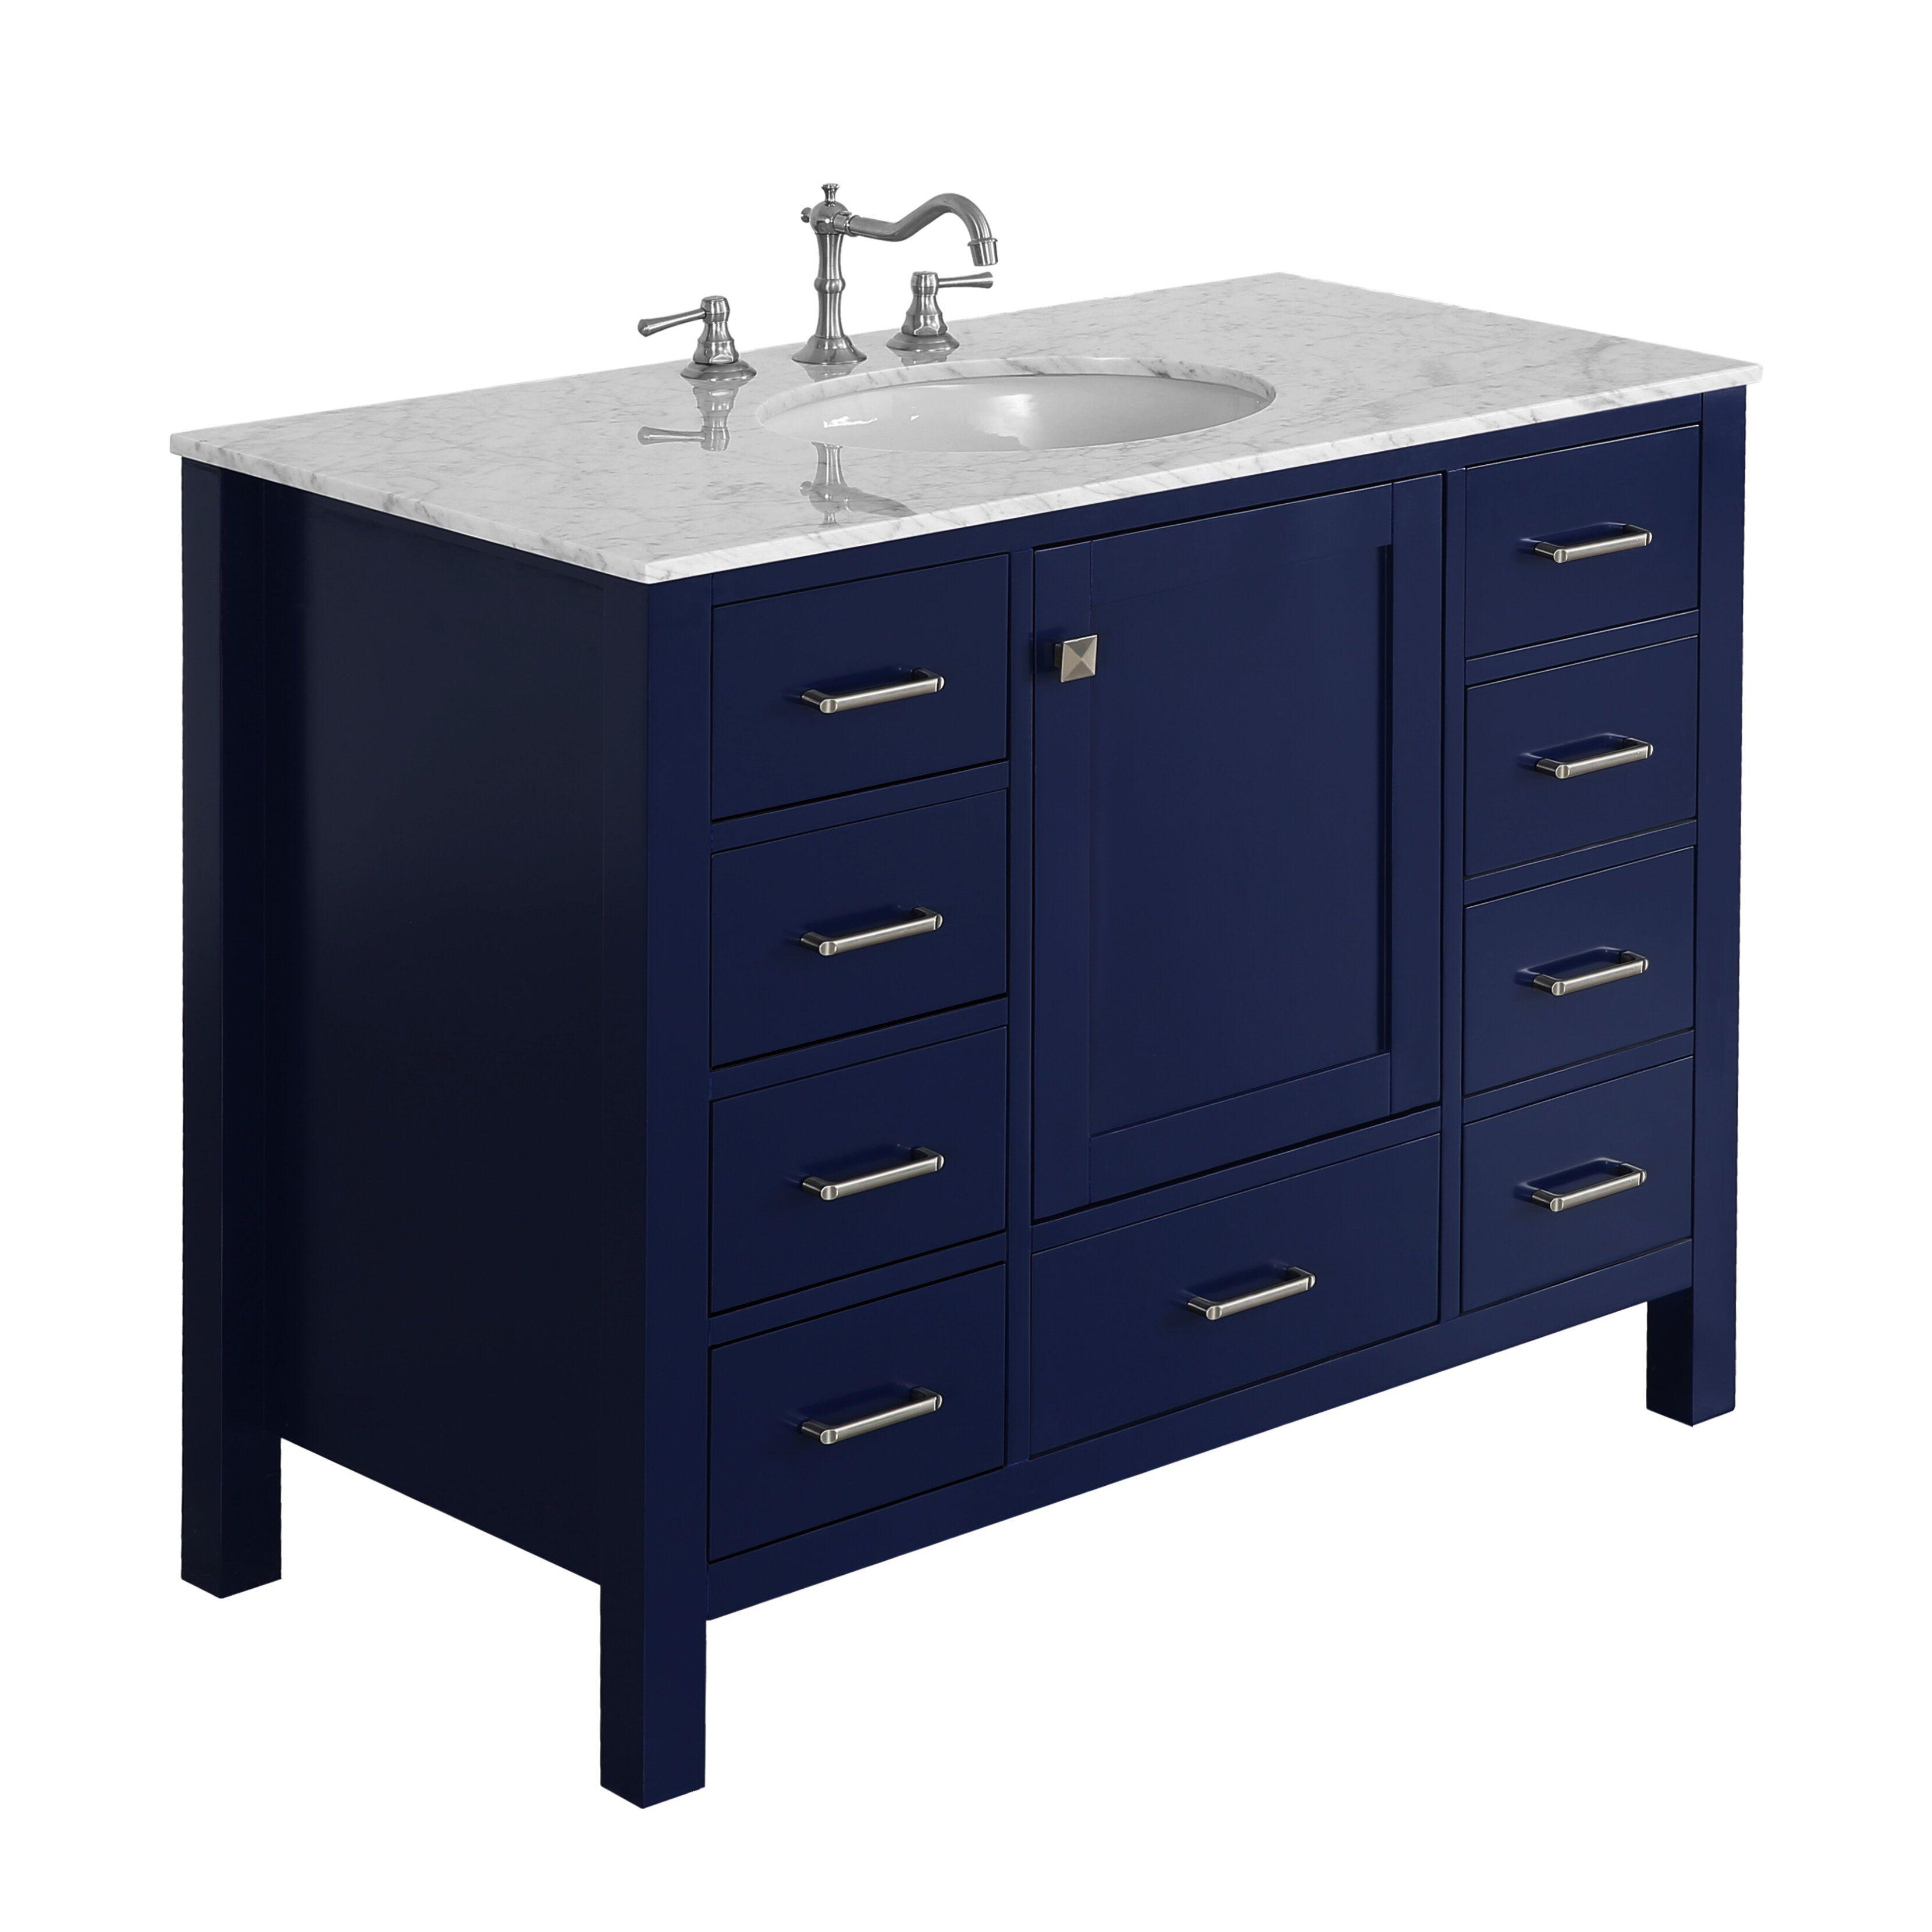 Cheshunt 42 Single Bathroom Vanity Set